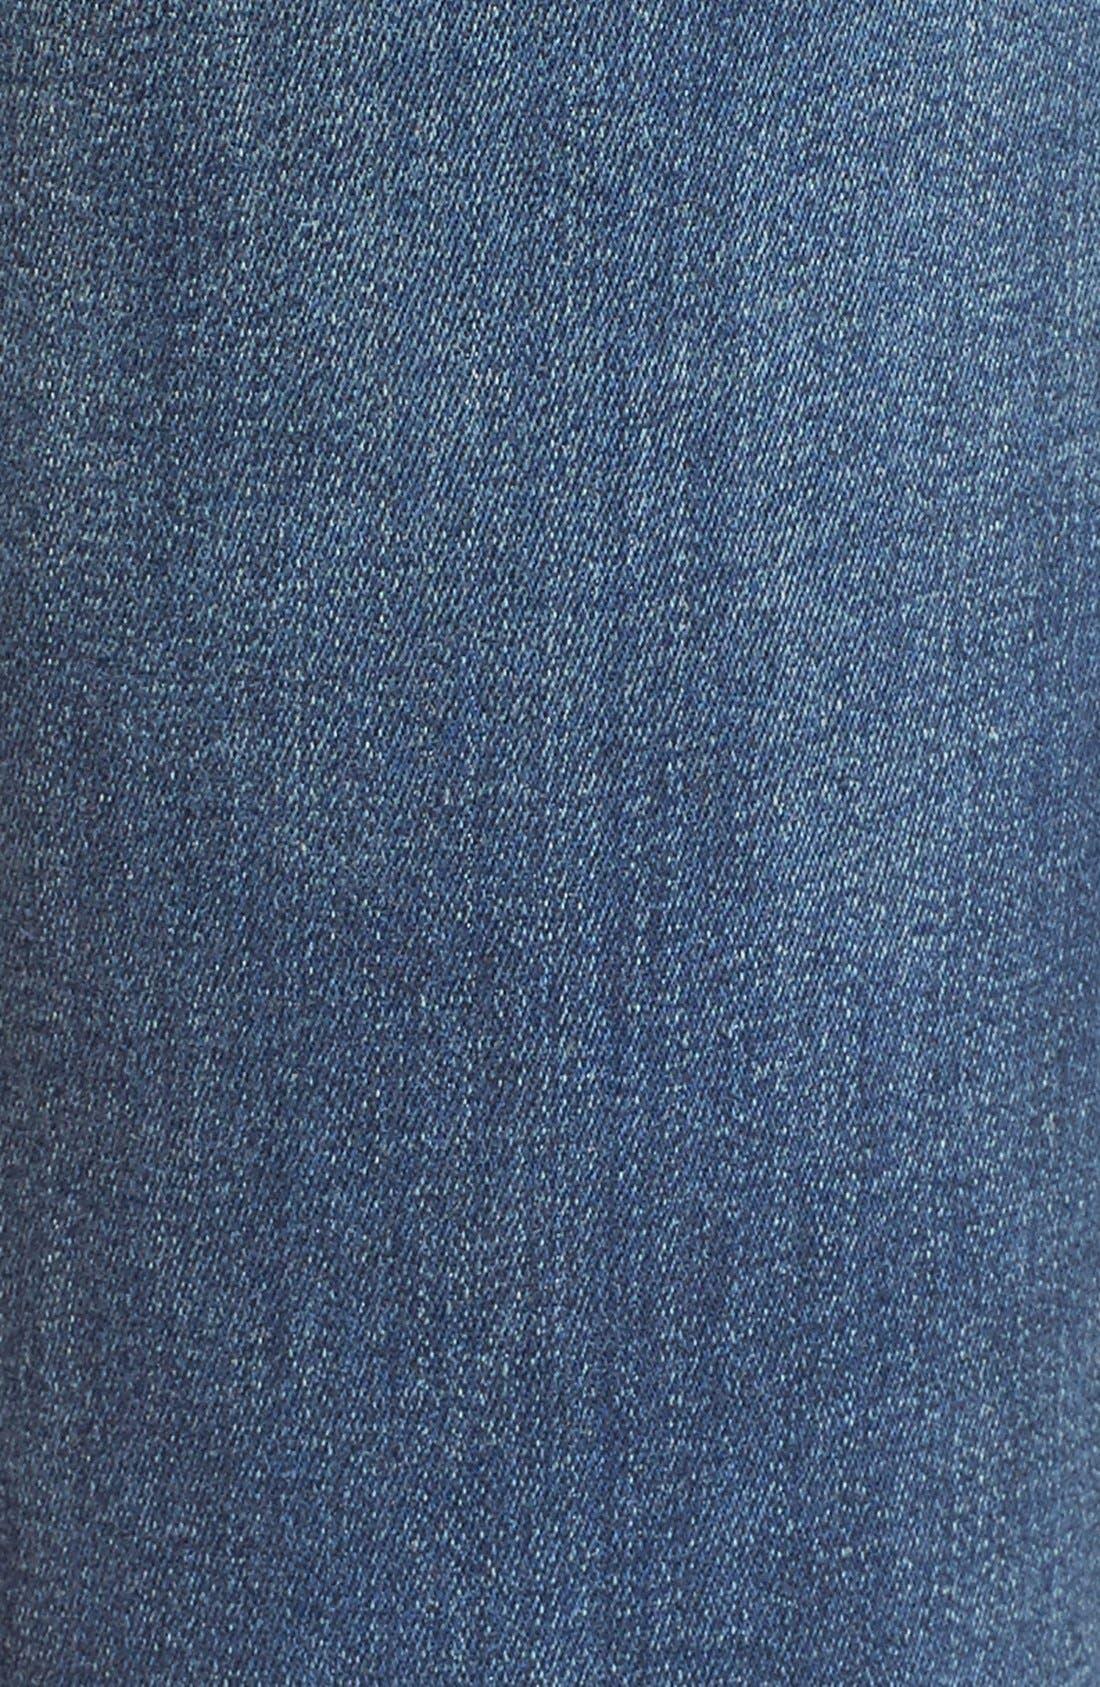 Alternate Image 5  - Vigoss 'Thompson' Distressed Skinny Jeans (Neptune)